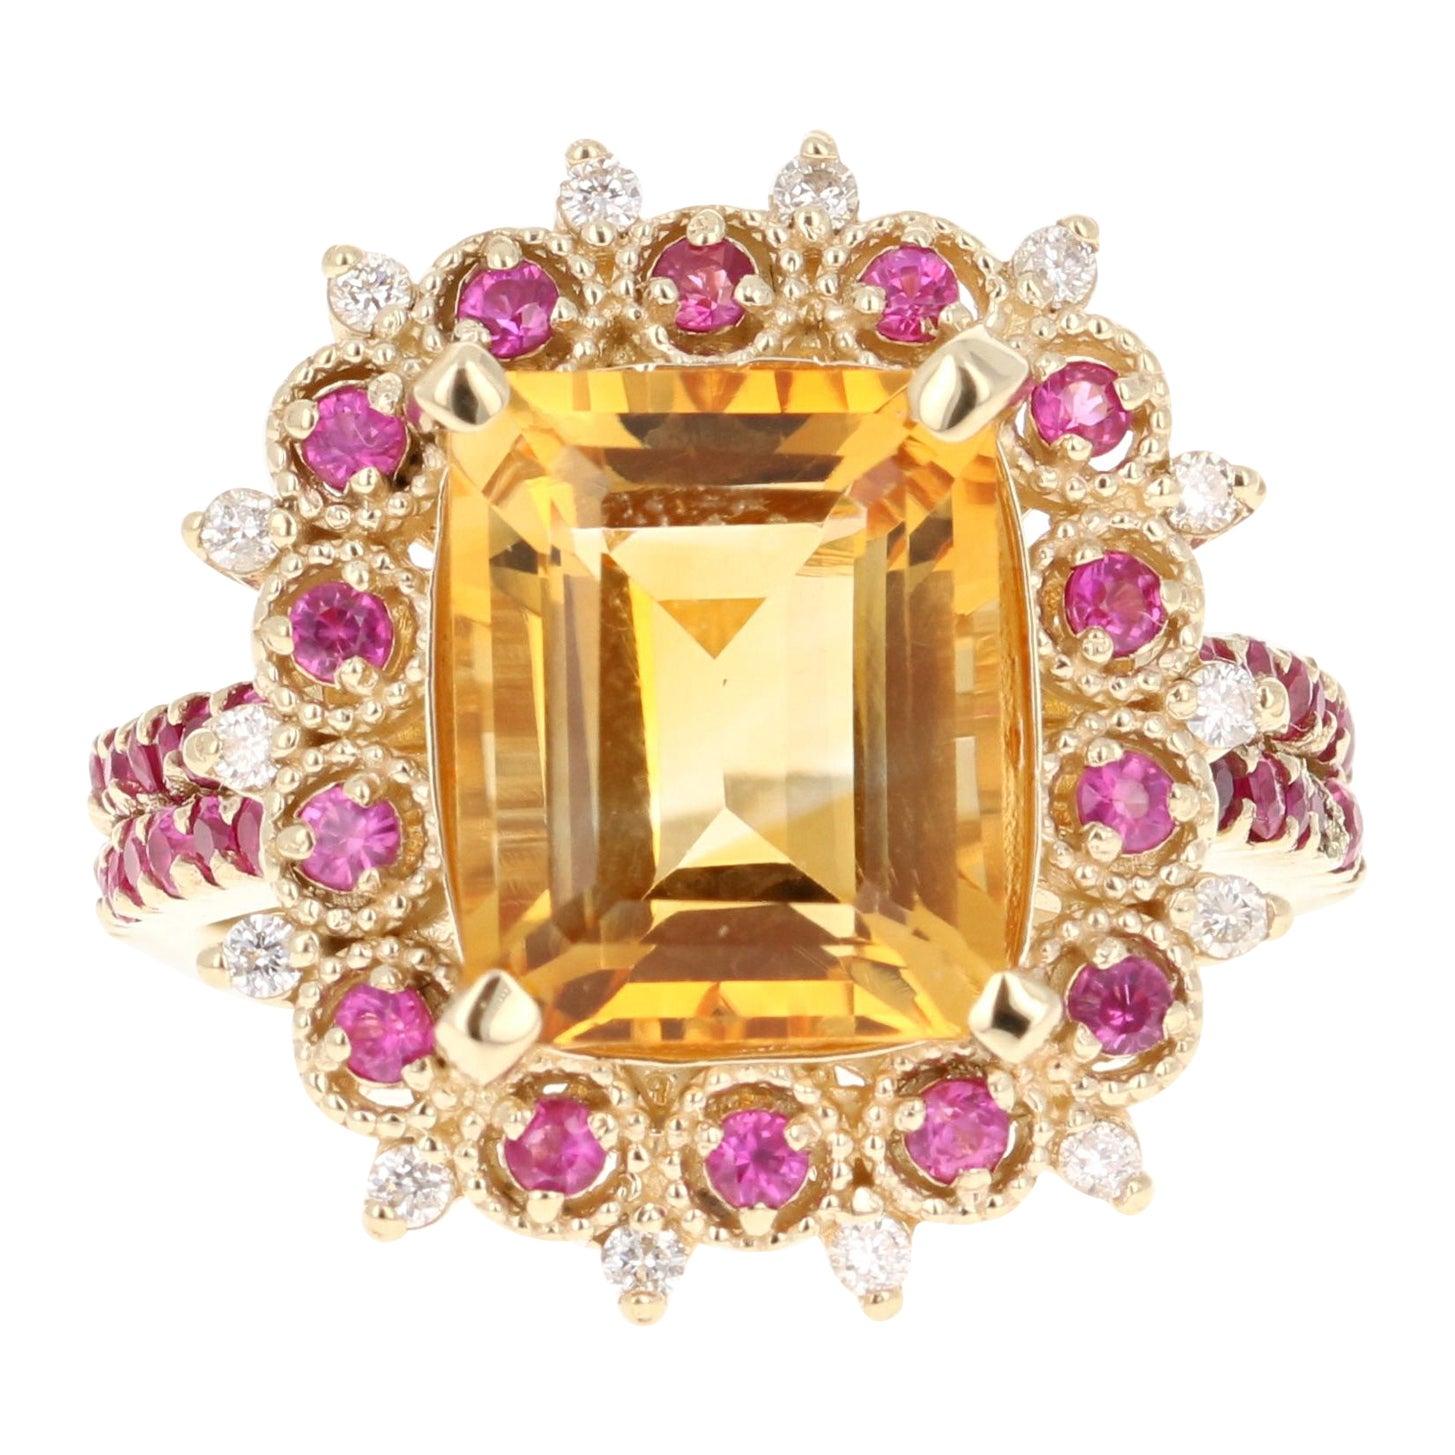 Emerald Cut Citrine, Sapphire and Diamond 14 Karat Yellow Gold Ring